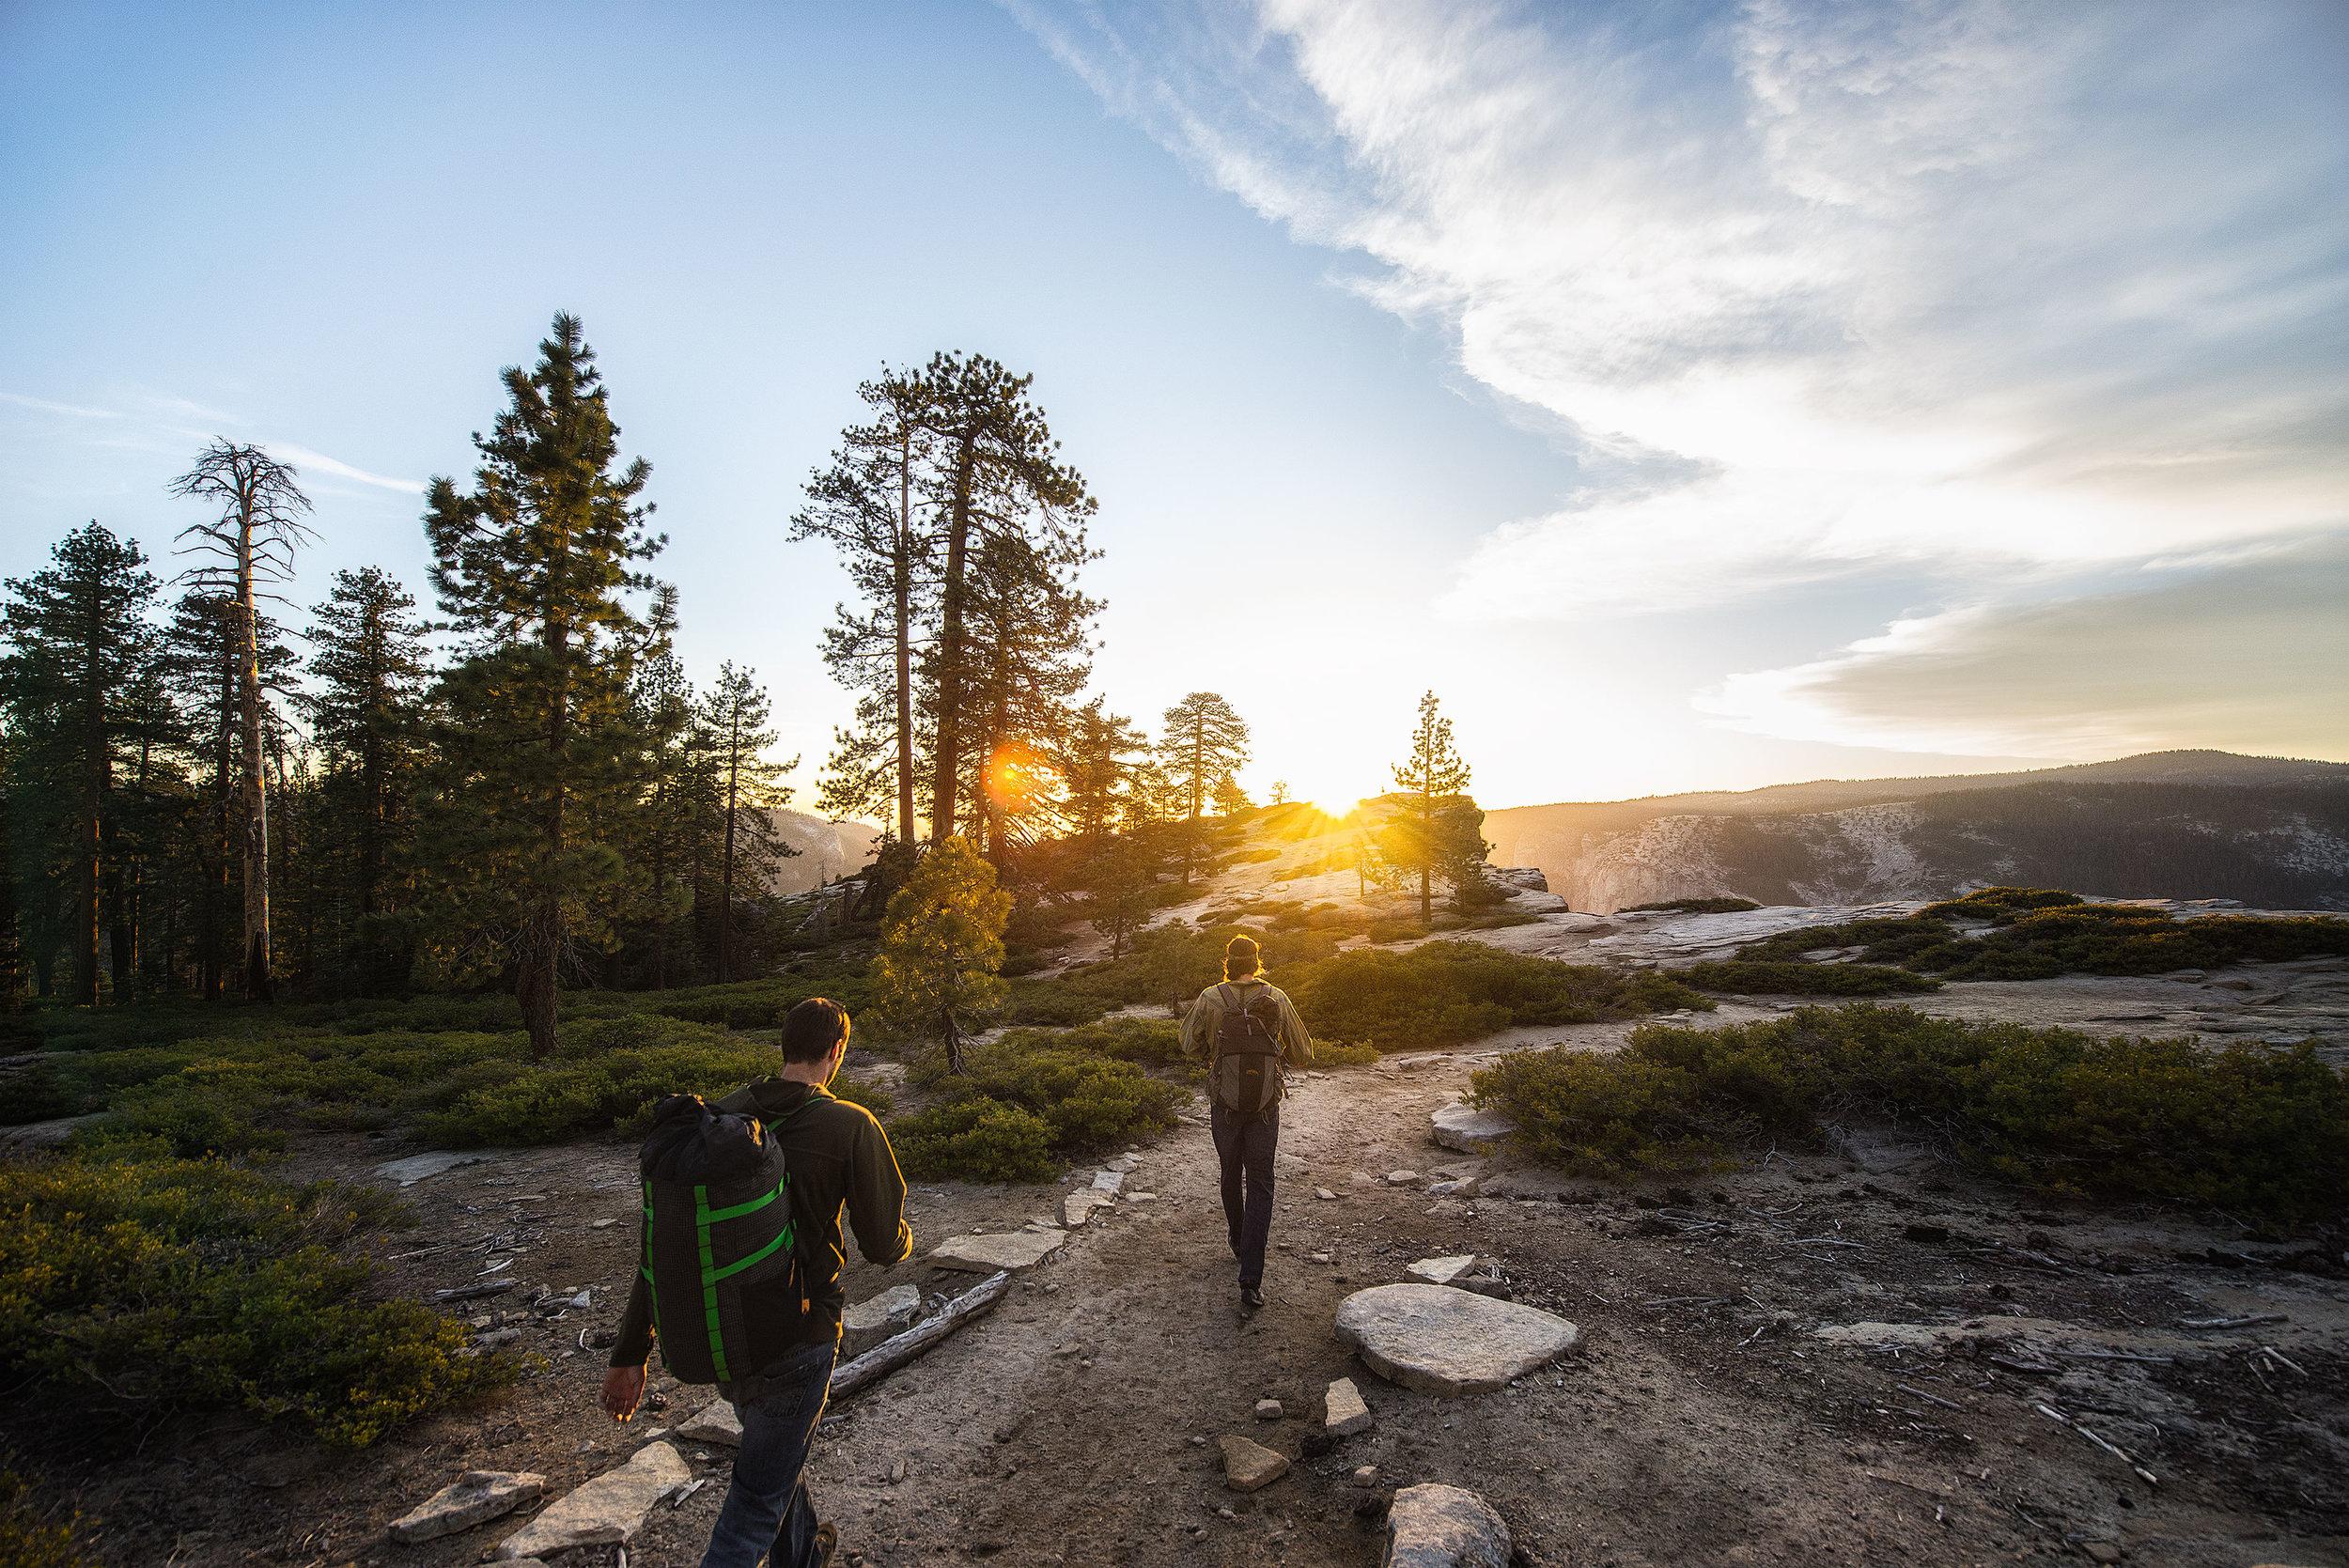 austin-trigg-wing-suit-base-jump-fly-dean-potter-yosemite-lifestyle-california-adventure-thrill-seeking-taft-point-sunset-lens-flare.jpg